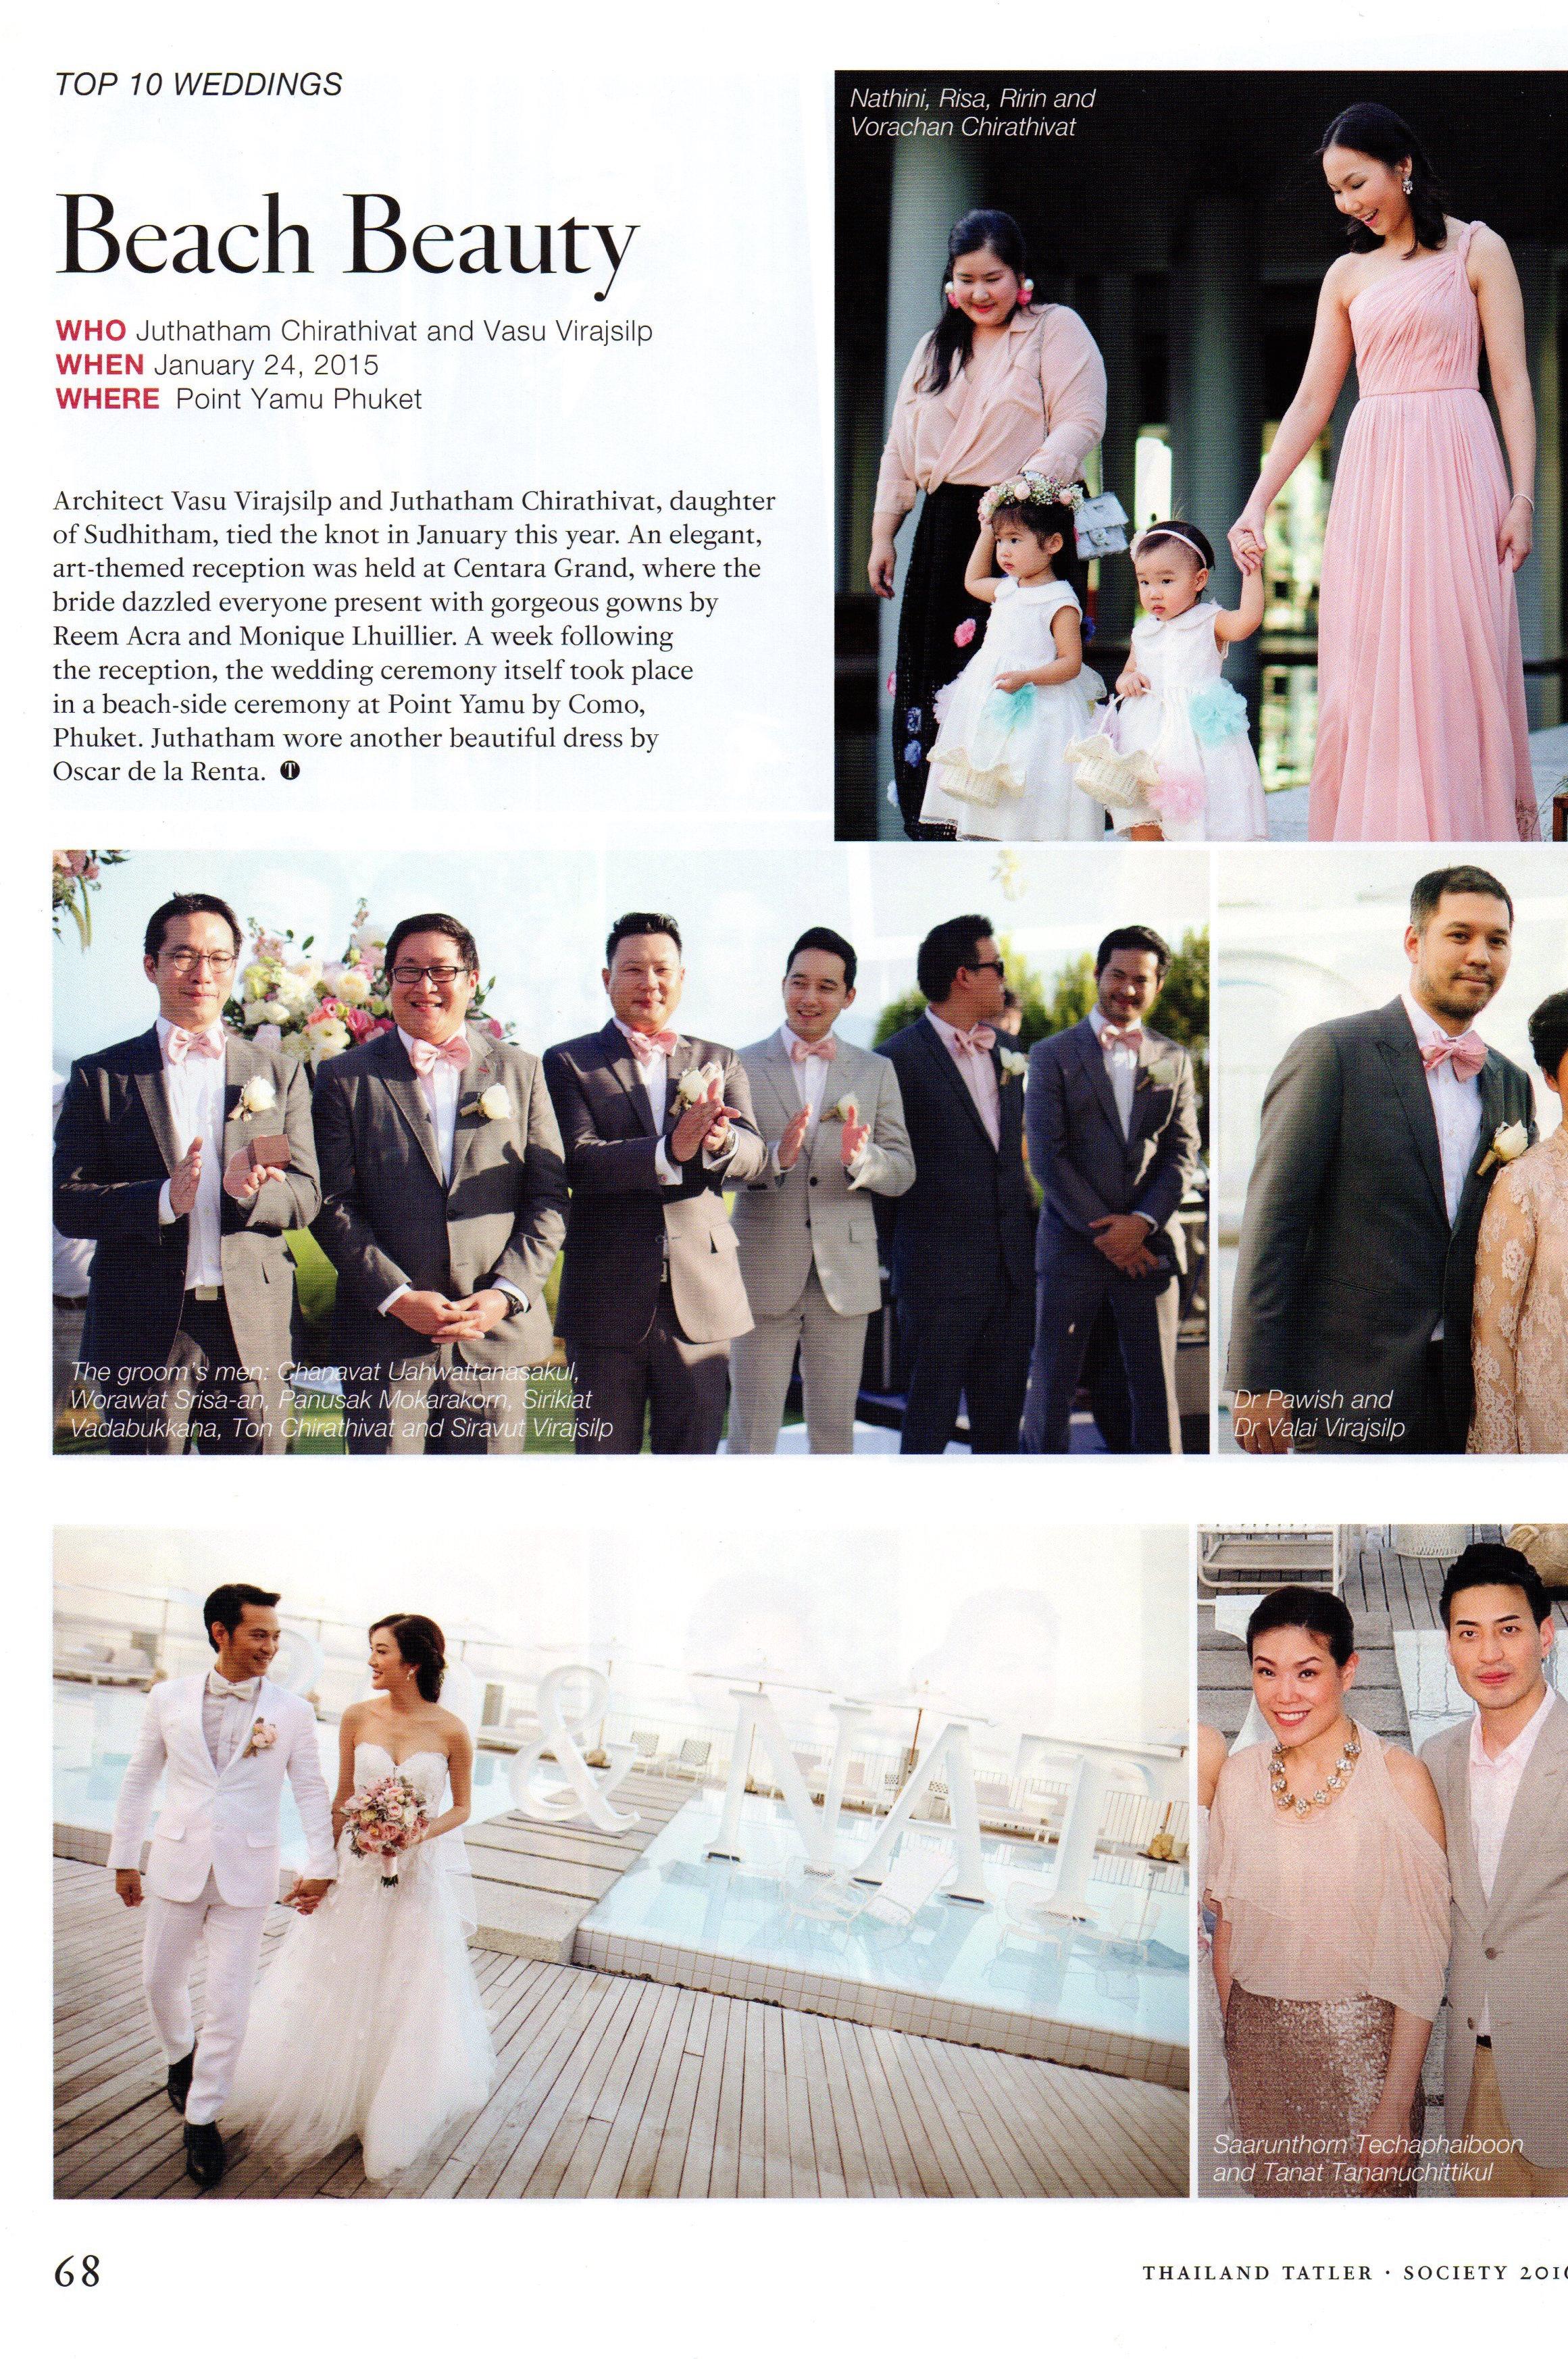 Thailand Tatler 3 - The Wedding Bliss Thailand